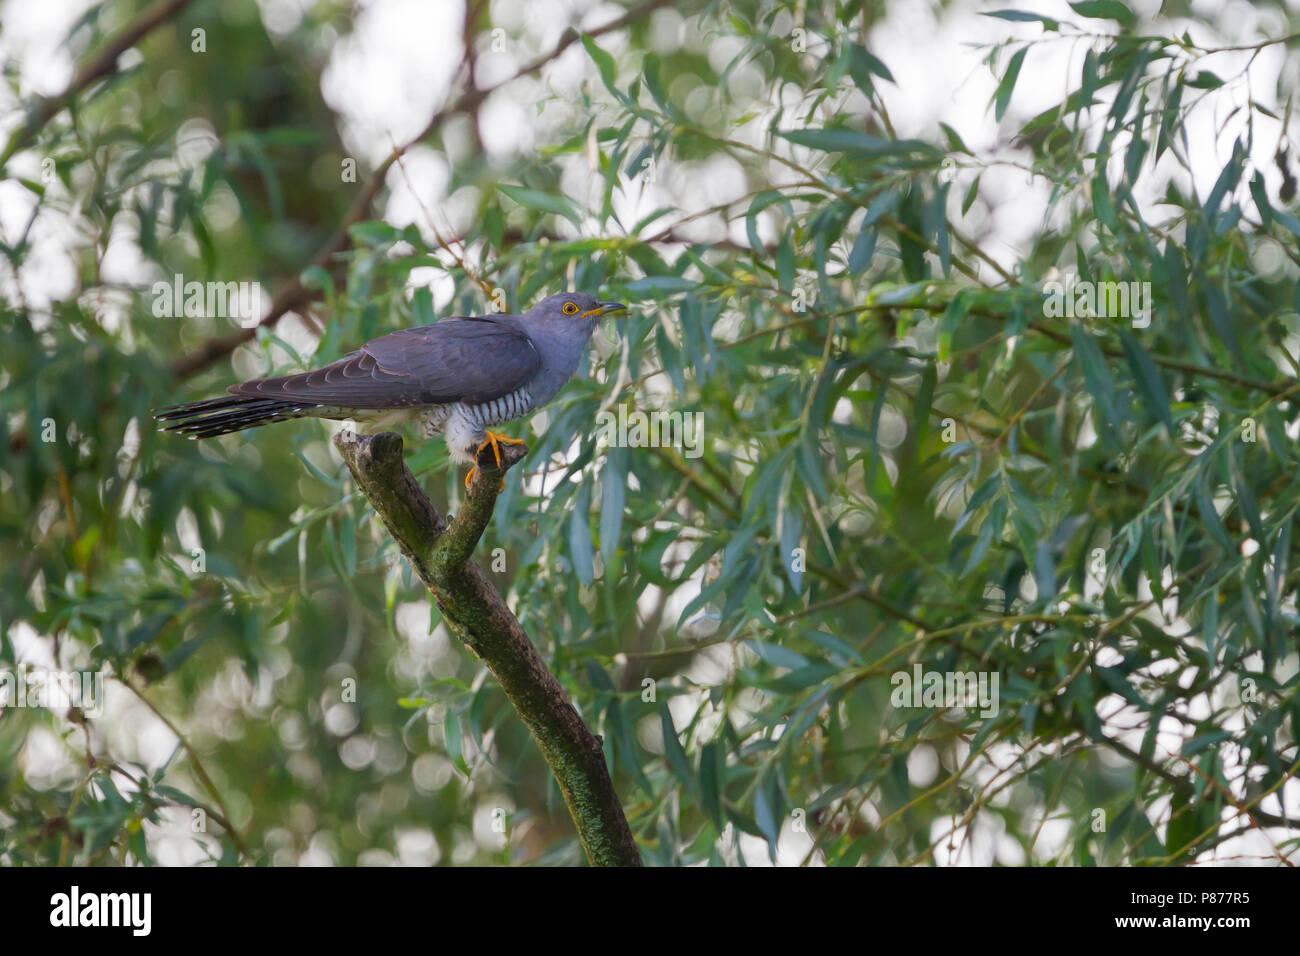 Cuckoo, Koekoek, Cuculus canorus ssp. canorus, Hungary, adult, male - Stock Image